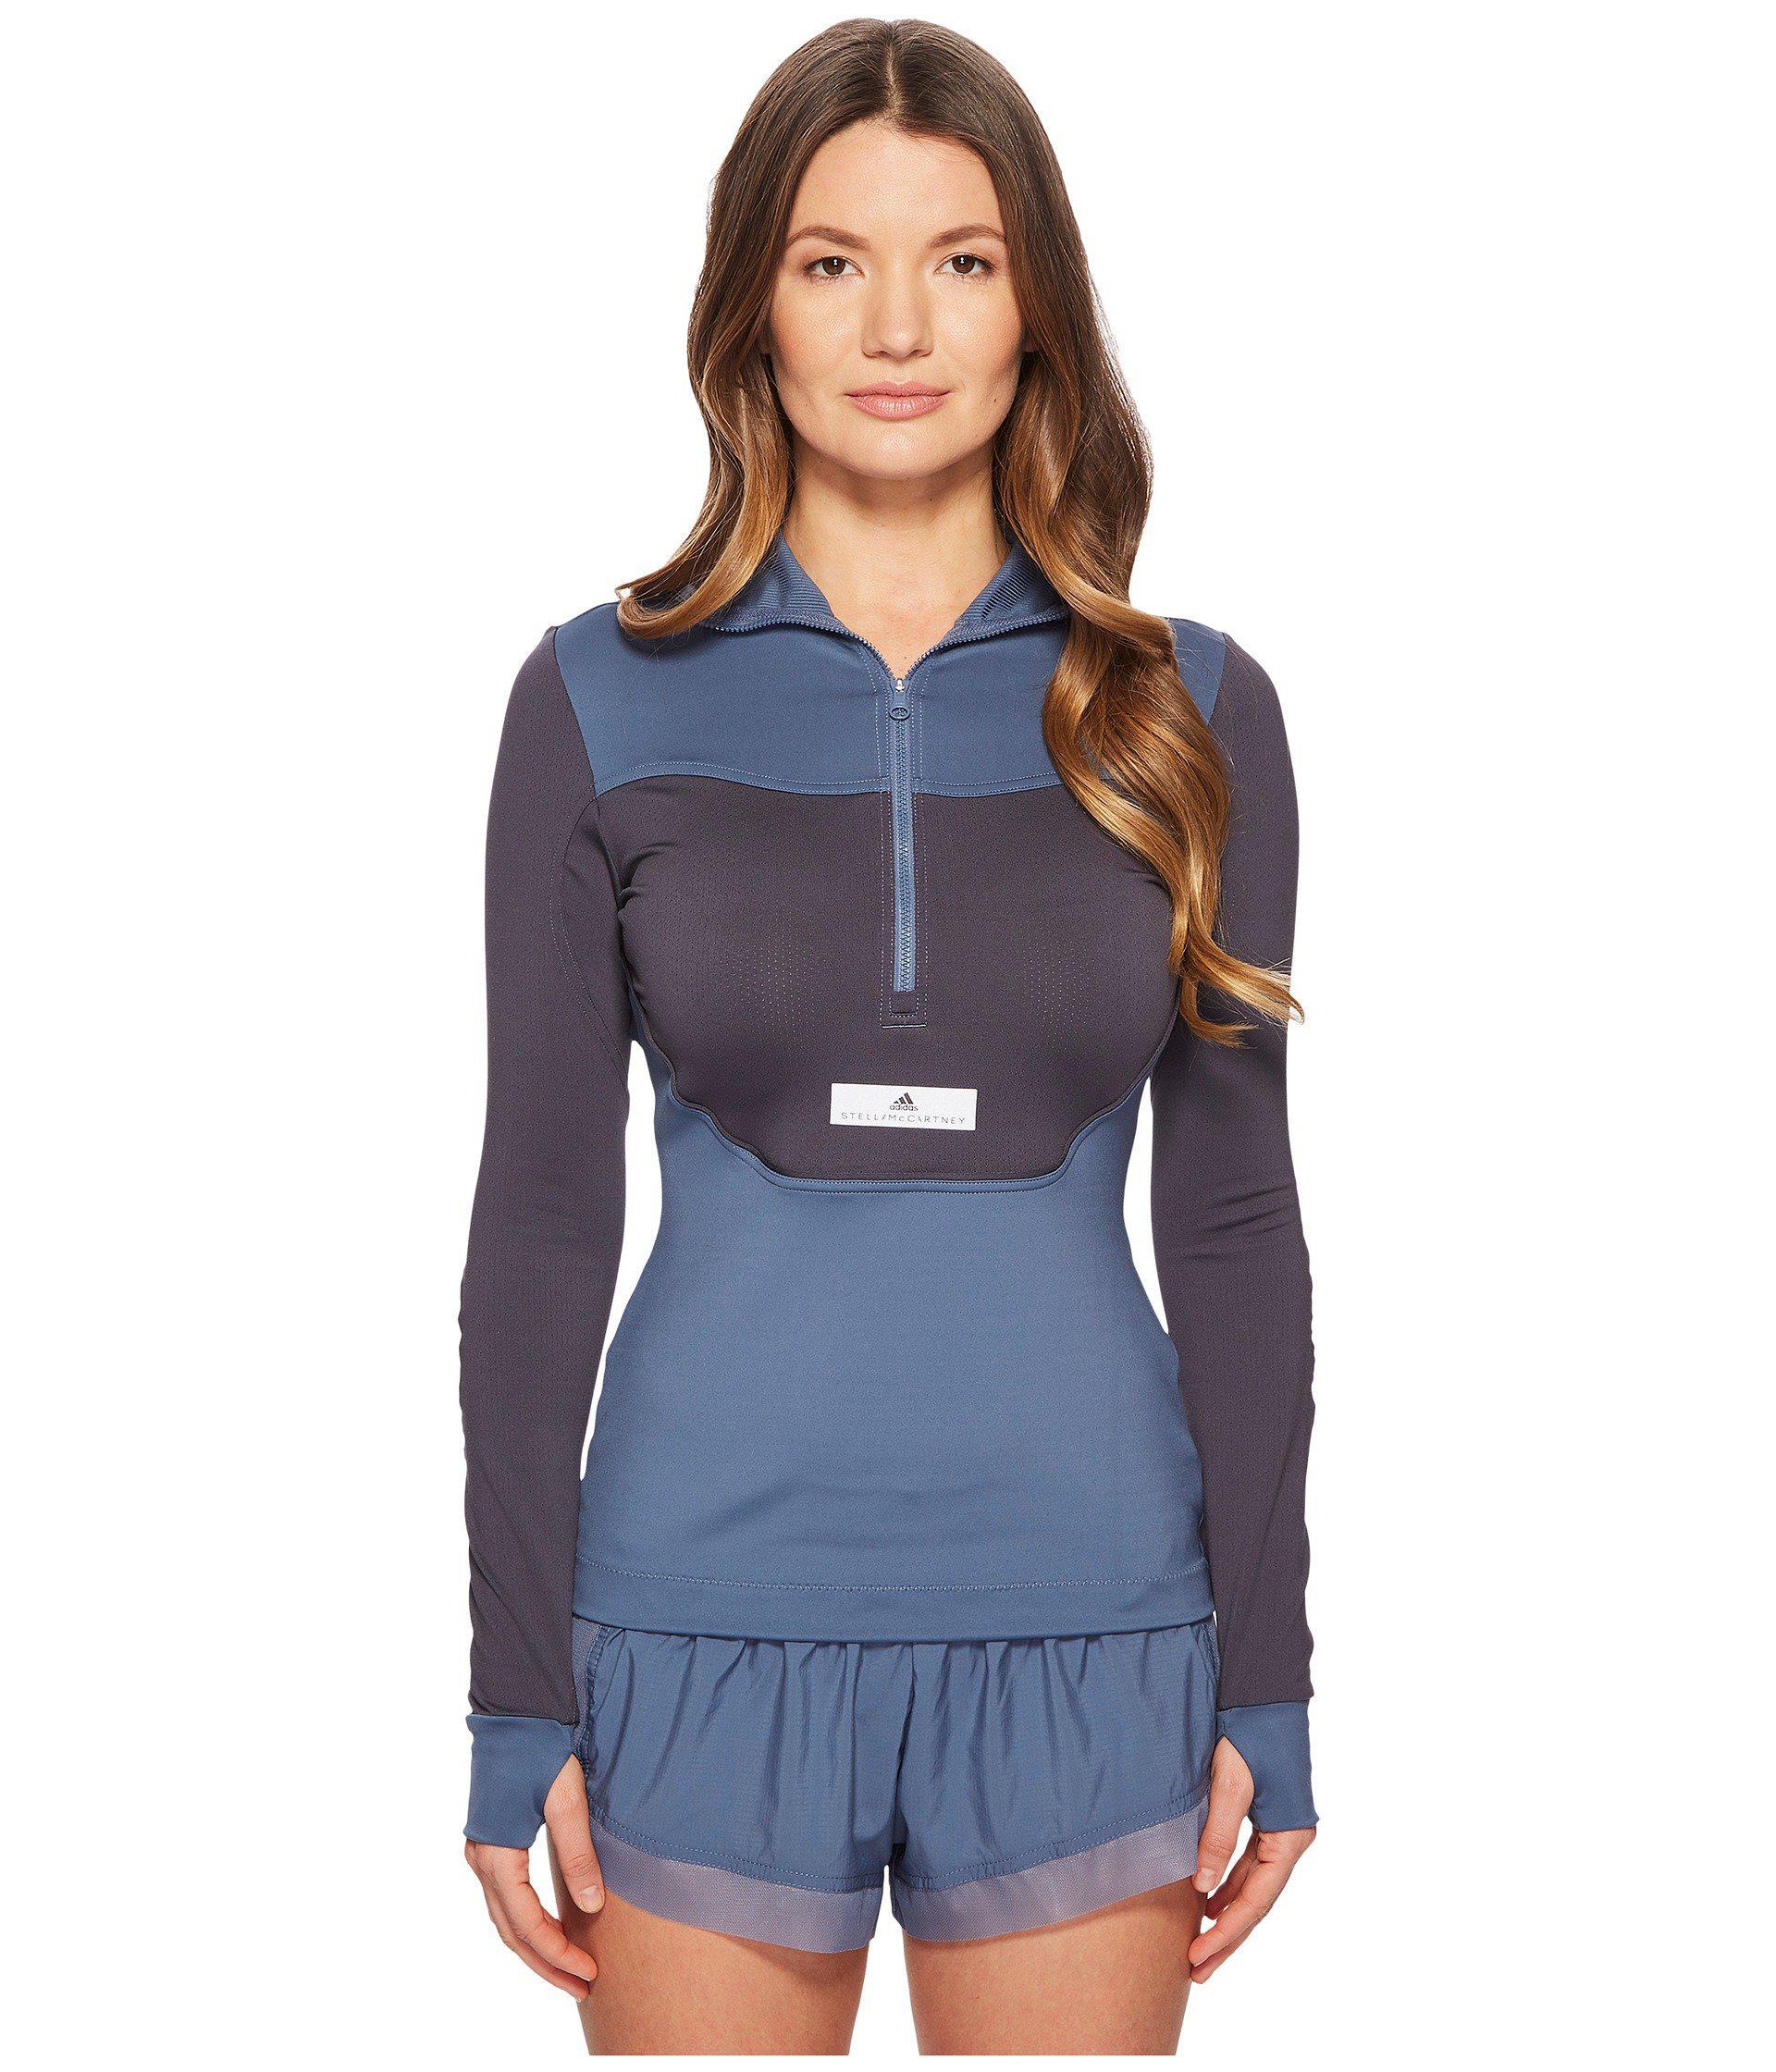 adidas By Stella McCartney. Women's Blue Run Hooded Long Sleeve Cg0137